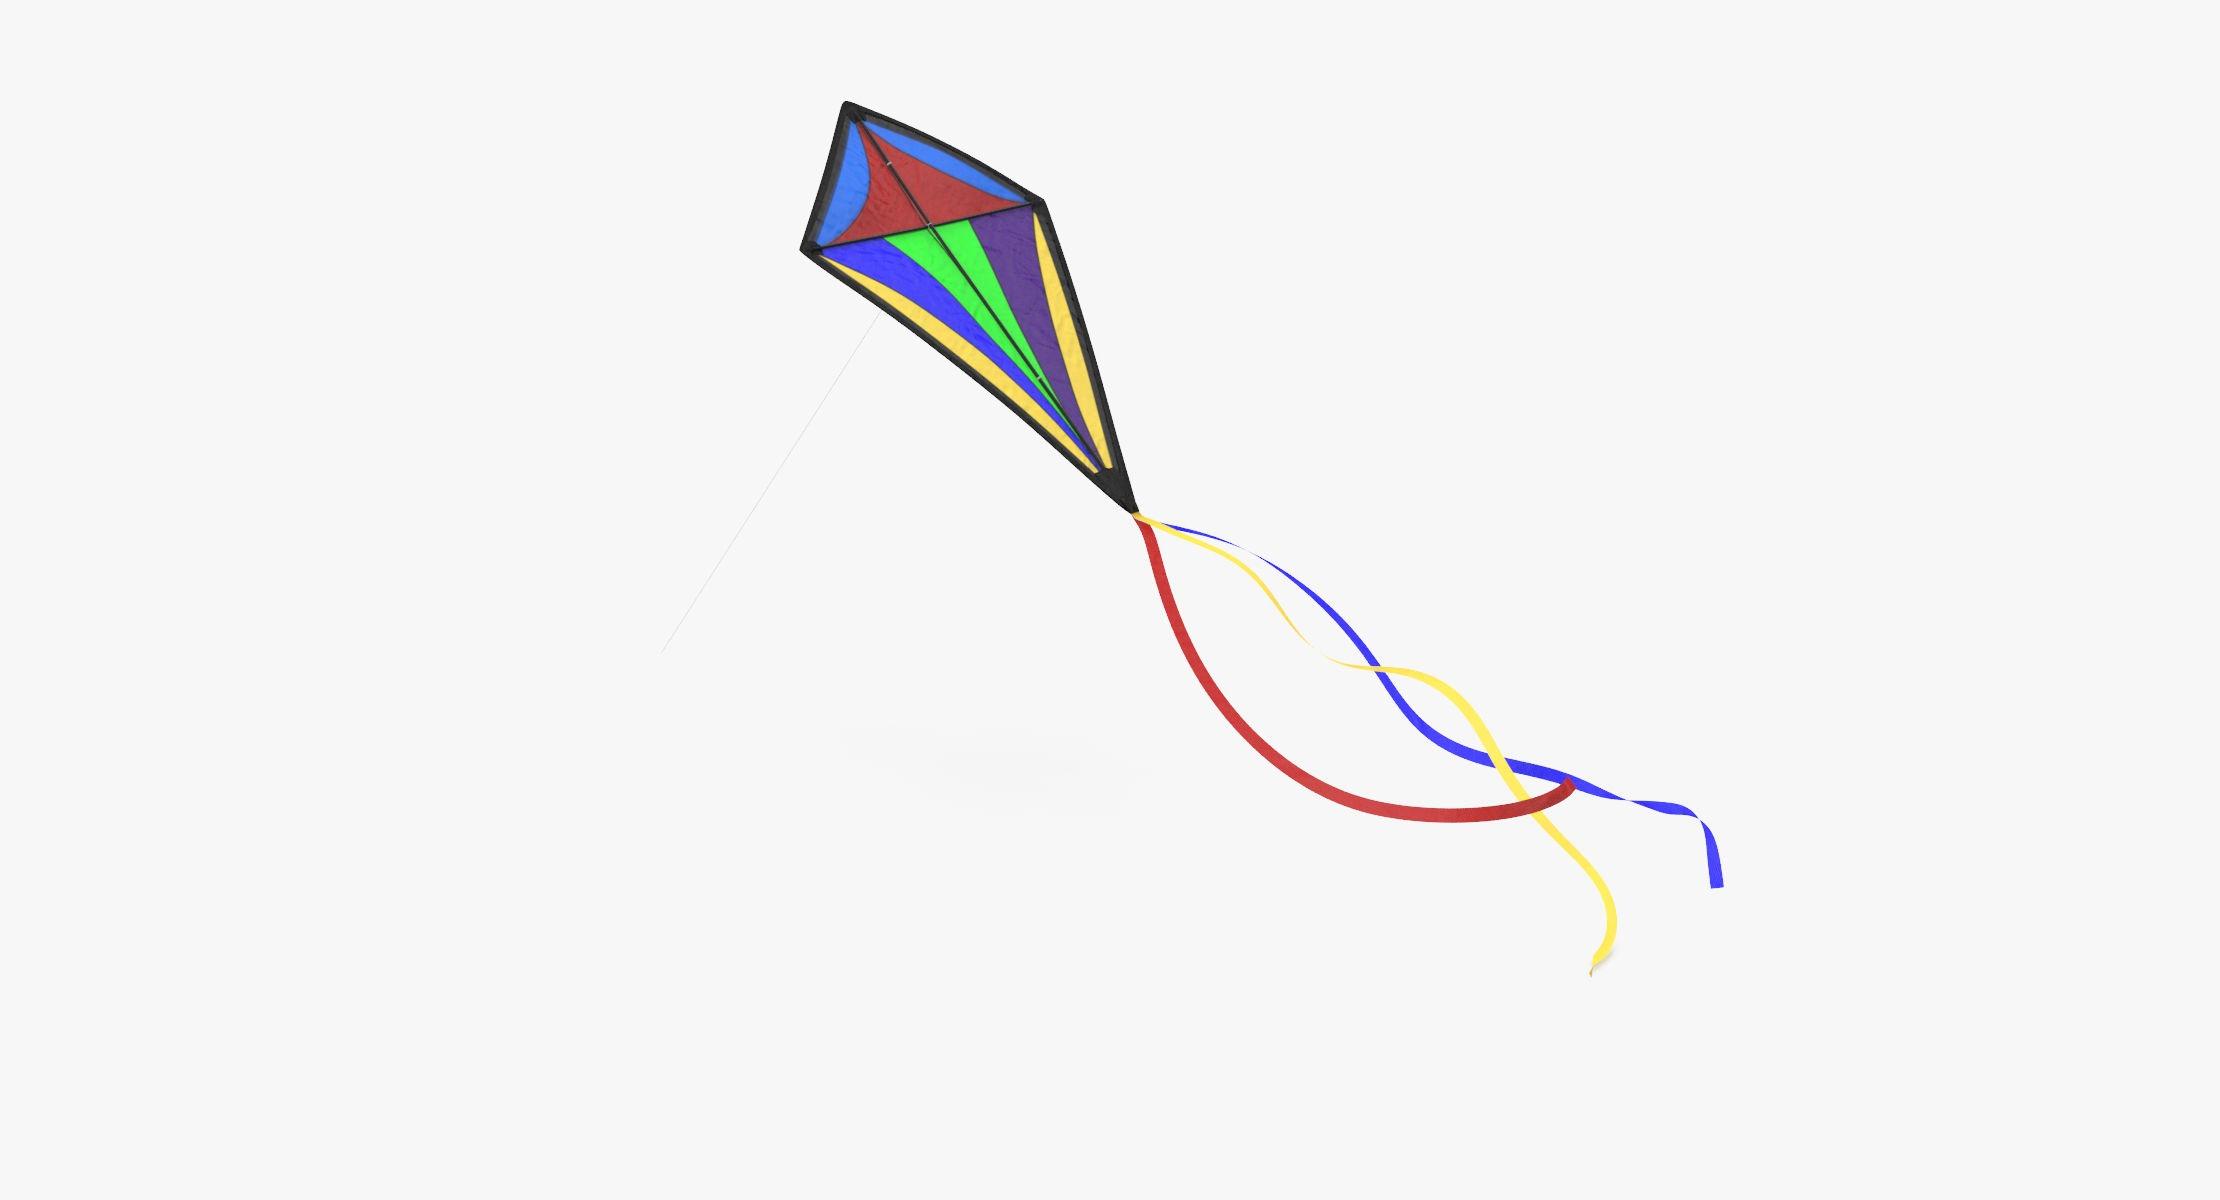 Kite 01 - reel 1